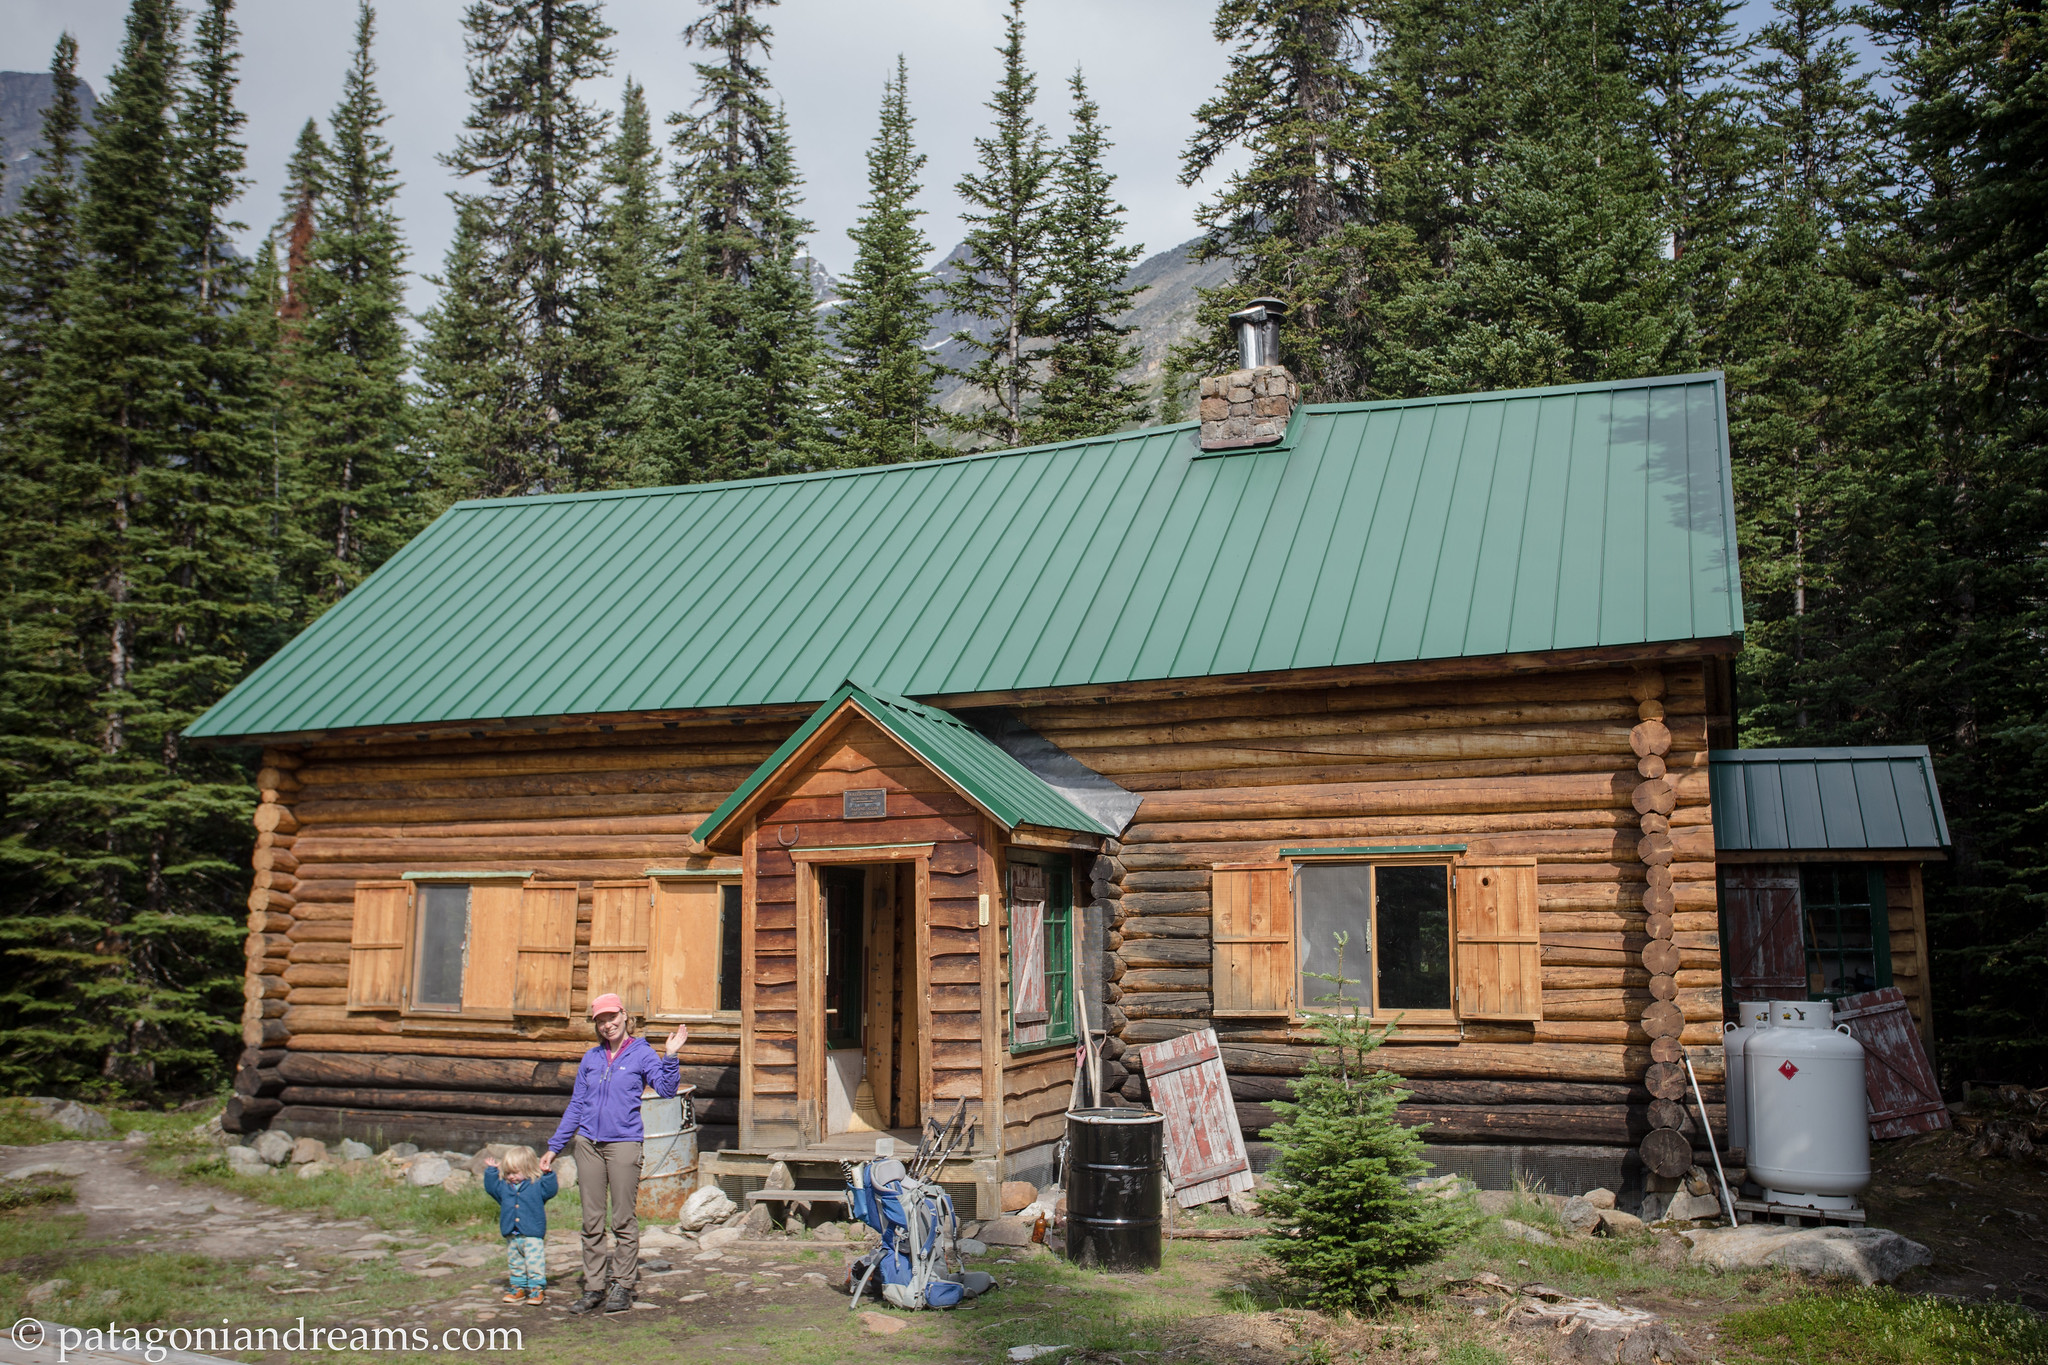 Wates-Gibson Hut Hut!